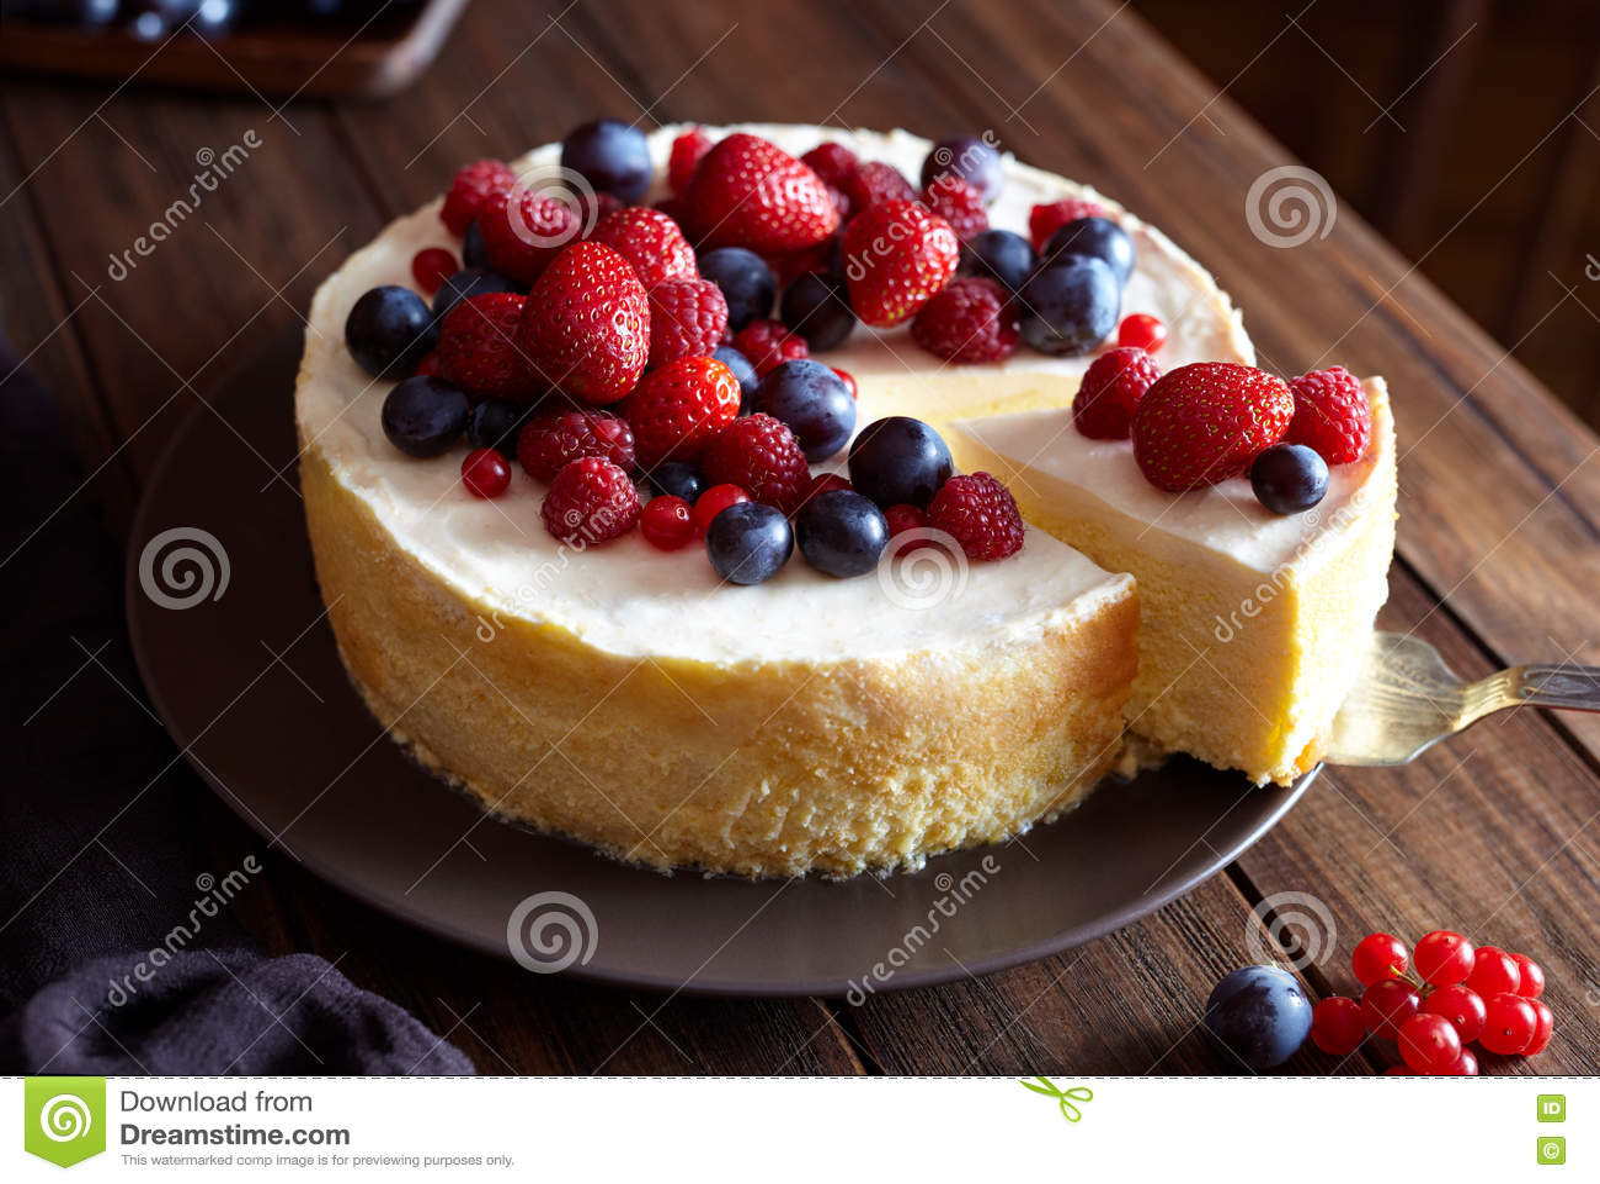 Creamy mascarpone cheese cake with strawberry and winter berries. New York Cheesecake. Close up.